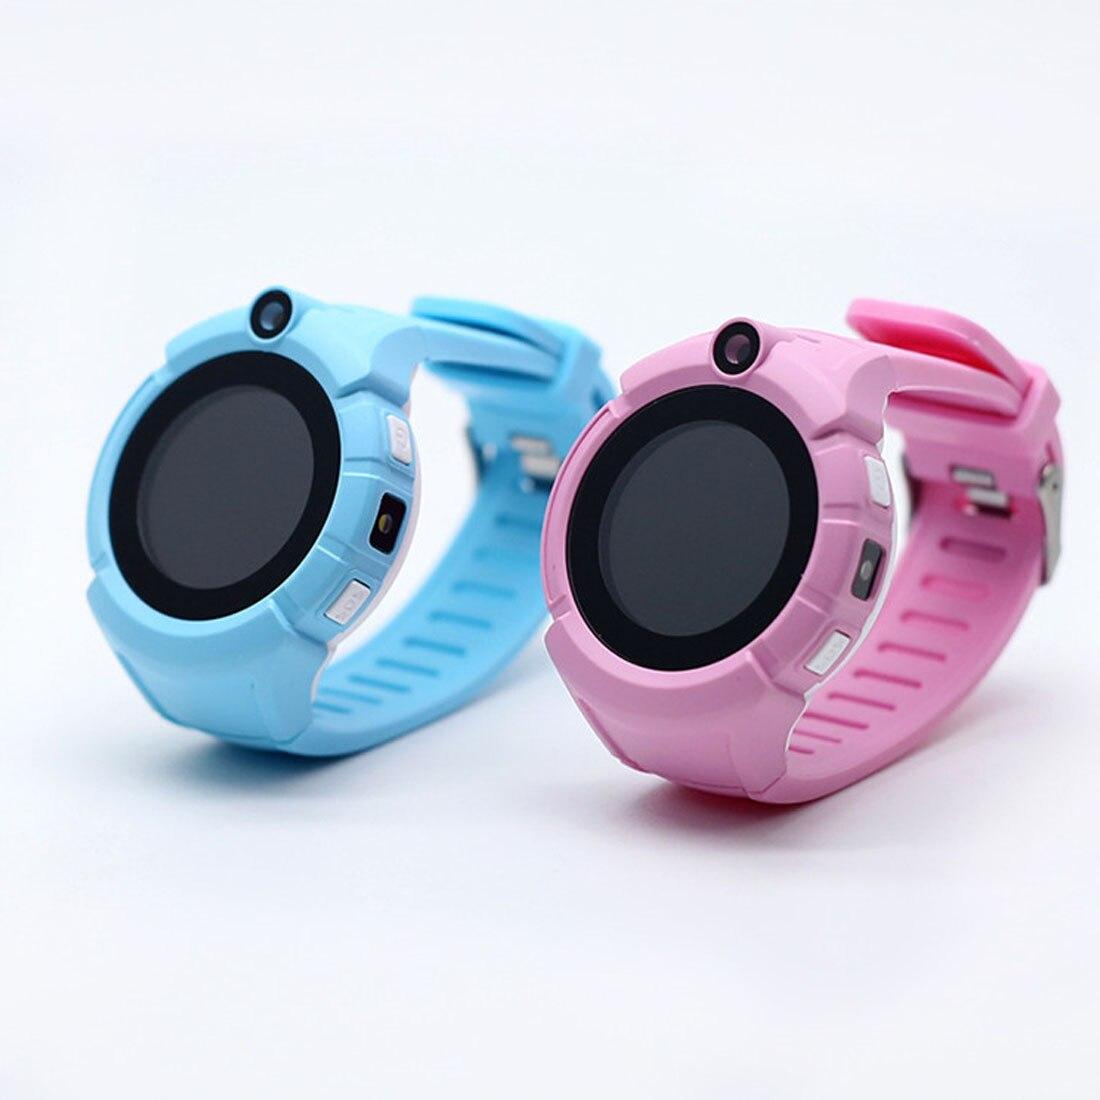 все цены на Q360 Kids Round Screen Smart Watch with Camera GPS WIFI Location Child smartwatch SOS Anti-Lost Monitor Tracker baby WristWatch онлайн